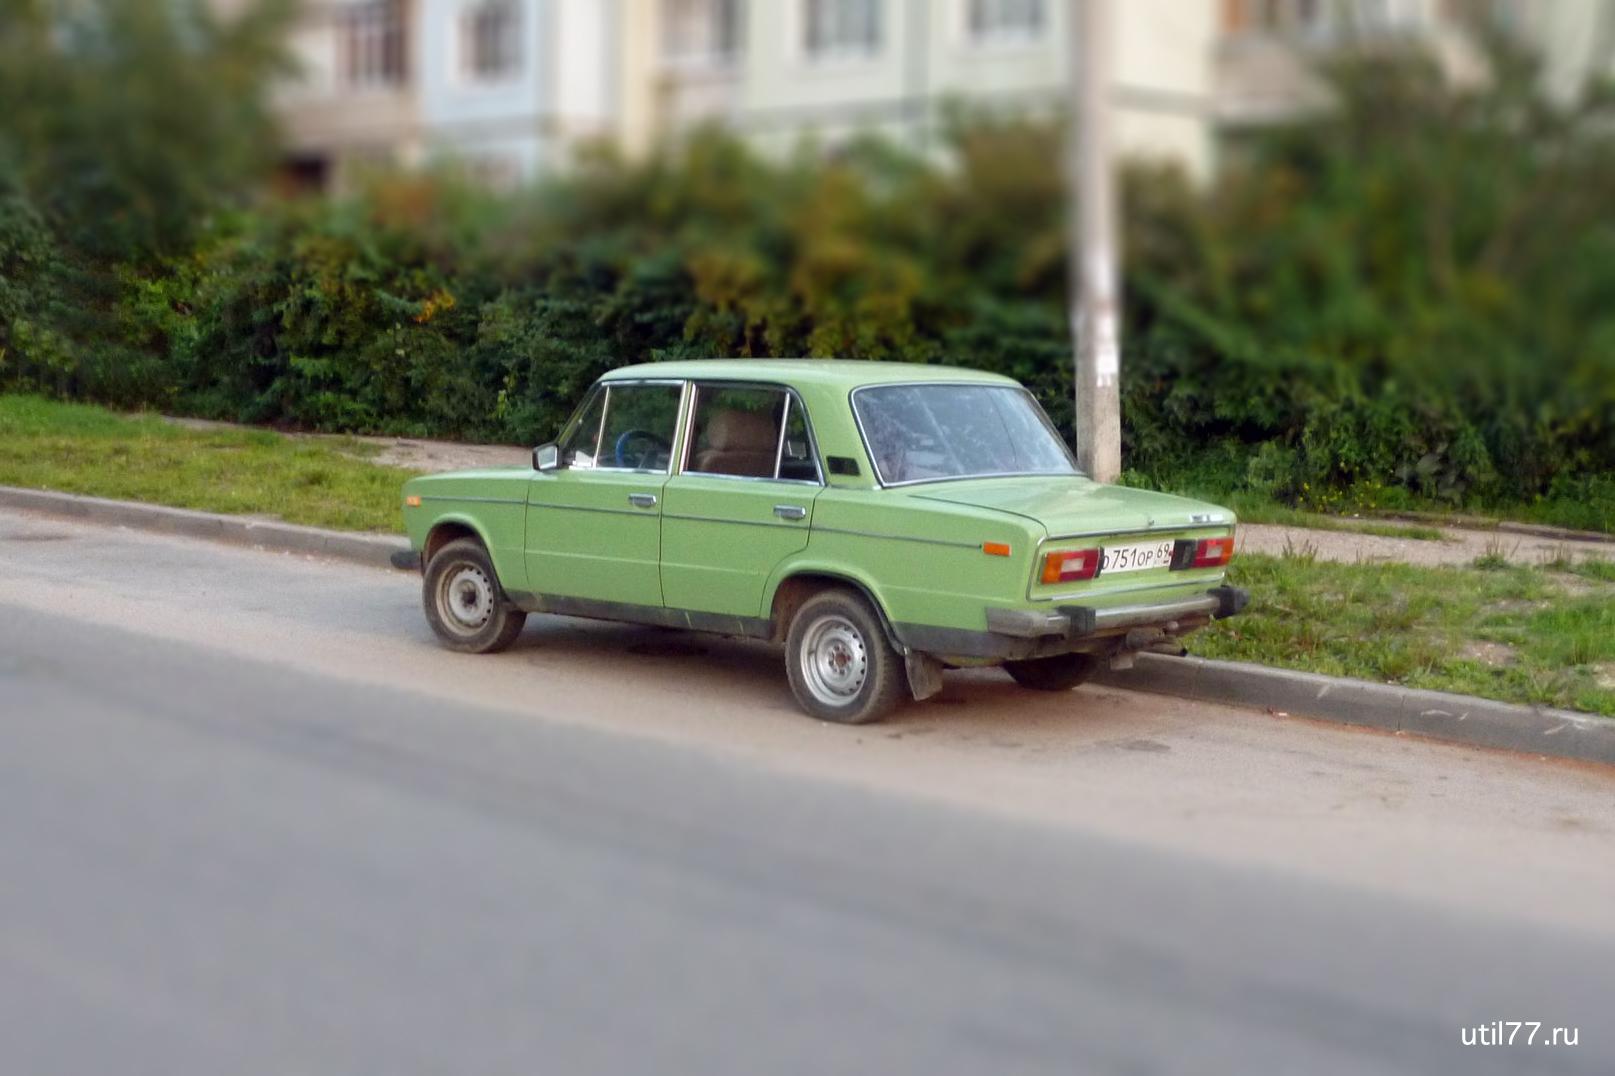 Автомобиль ВАЗ 2106 а утилизацию